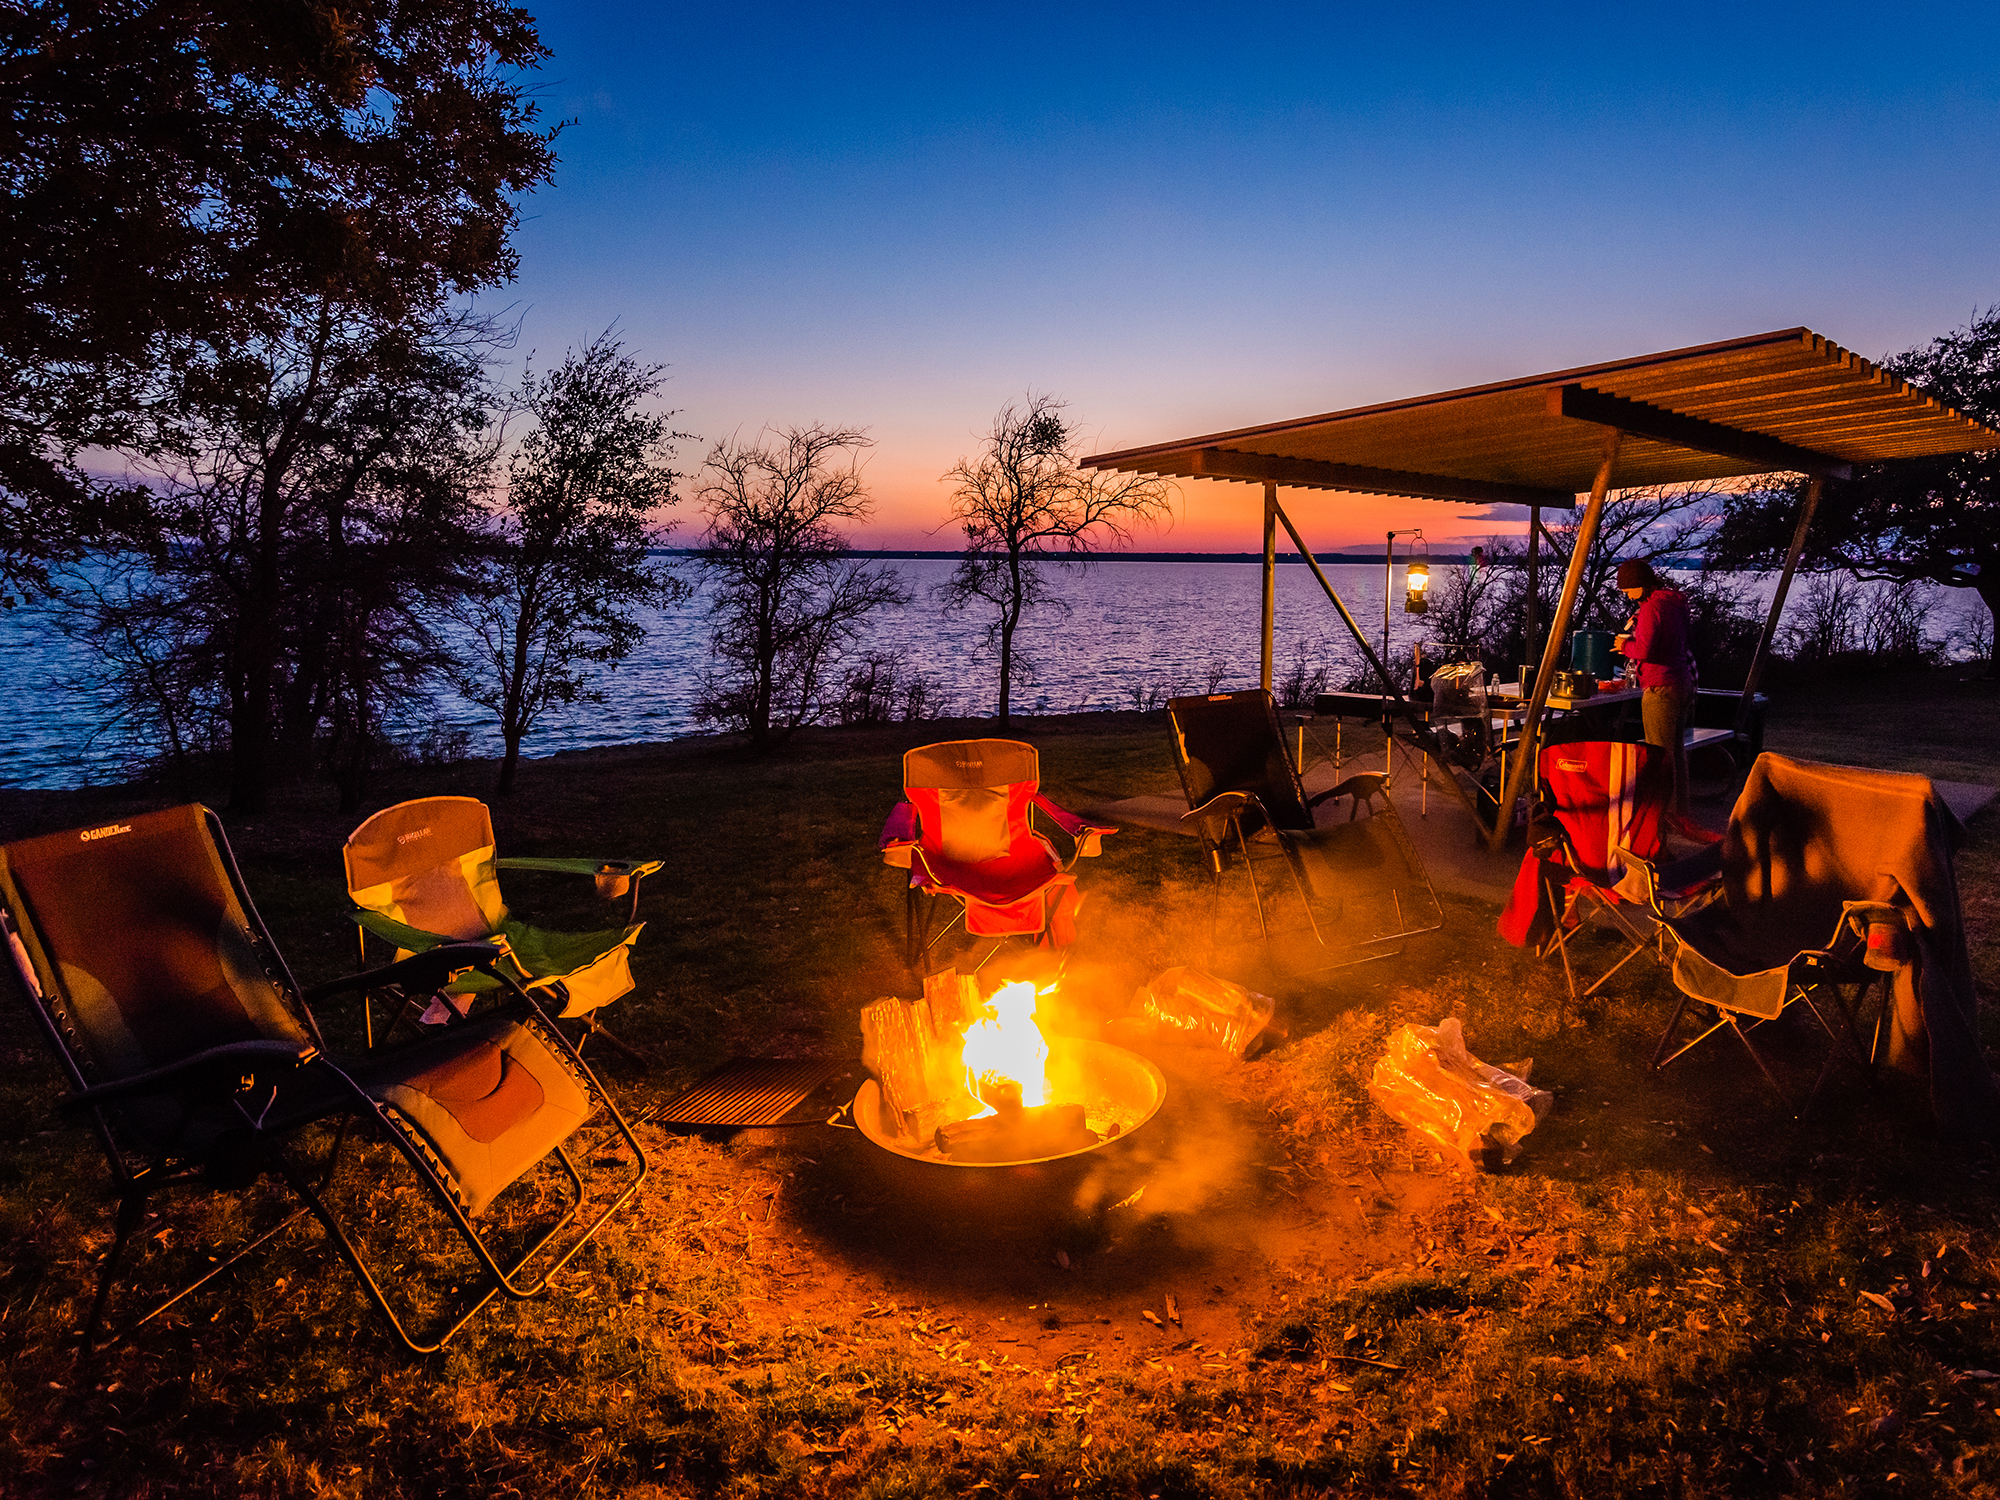 camp_fire_lake_dave_lund_24